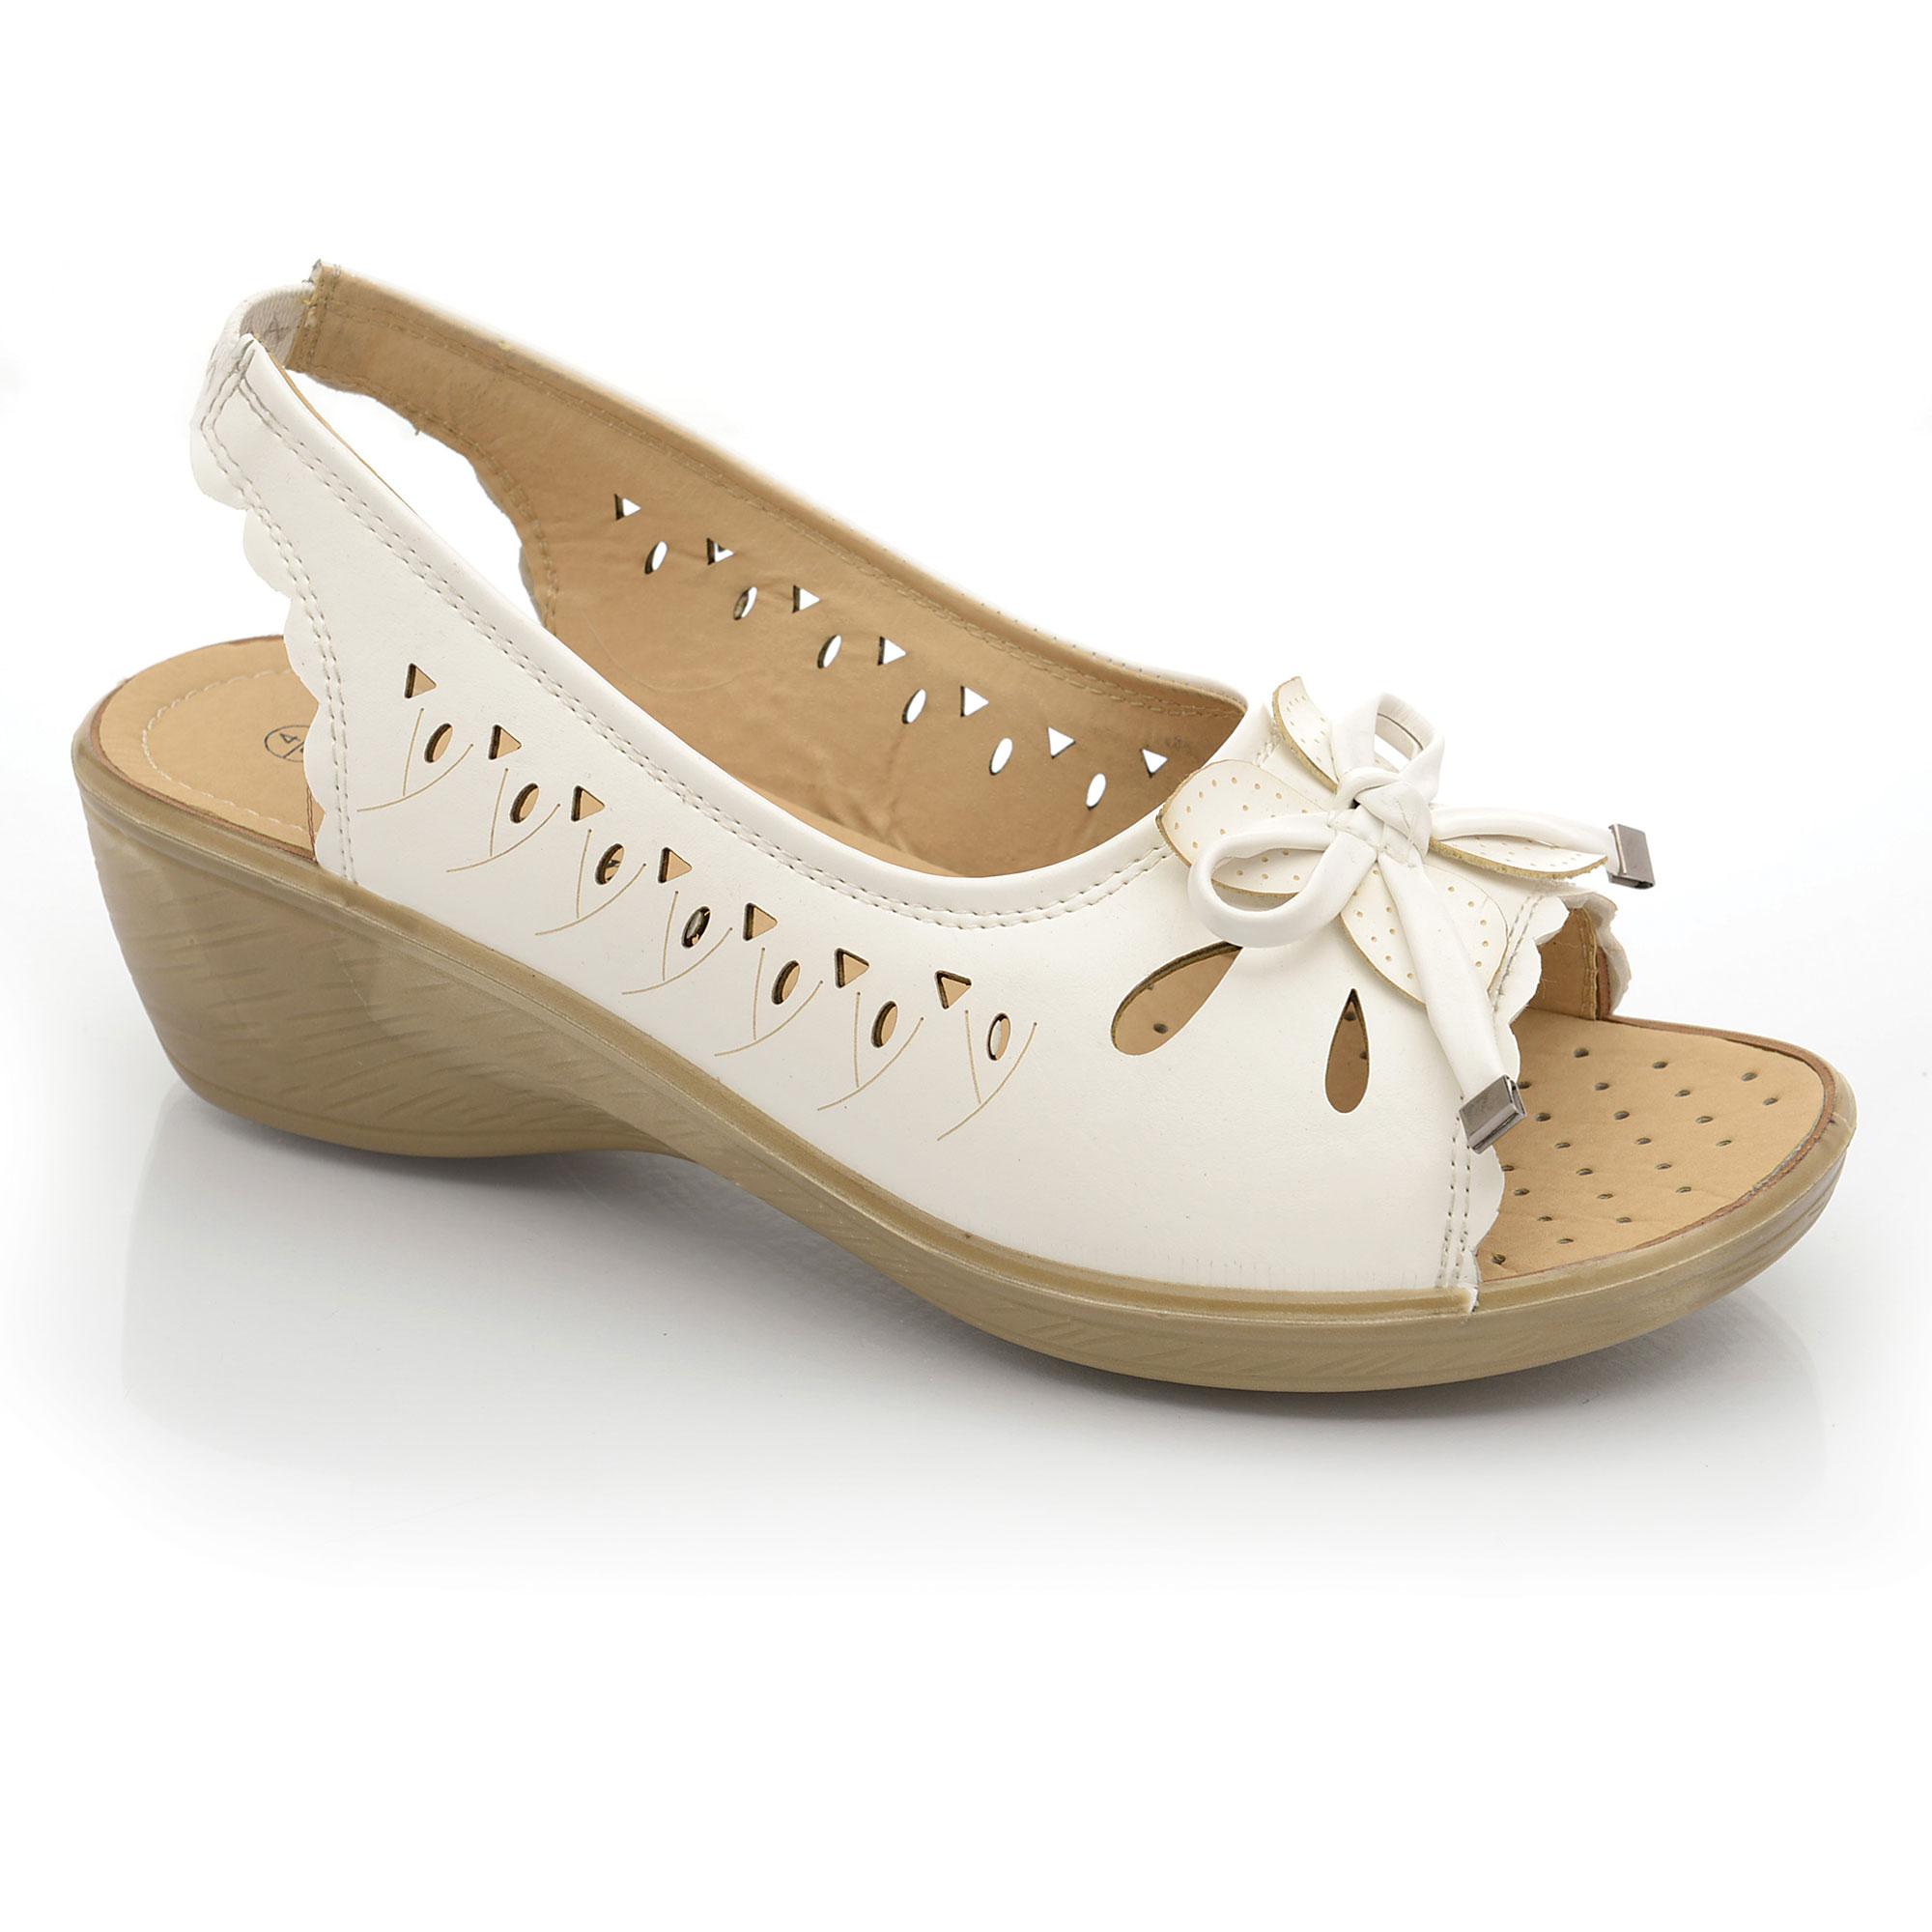 wide fit casual slip on slingback peep toe wedge